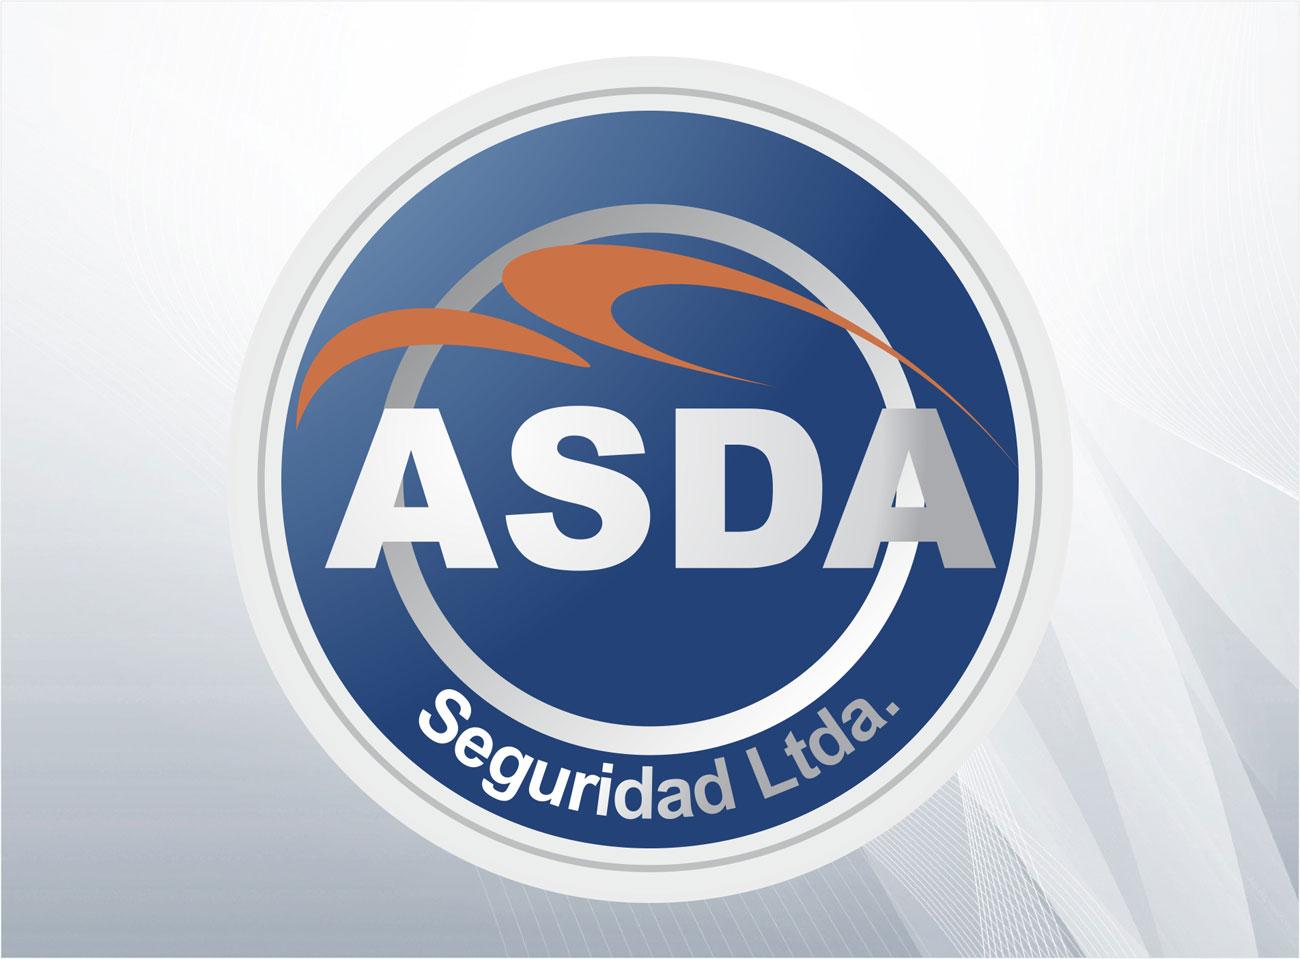 99_imagen_corporativa_asda_seguridad_ggcm